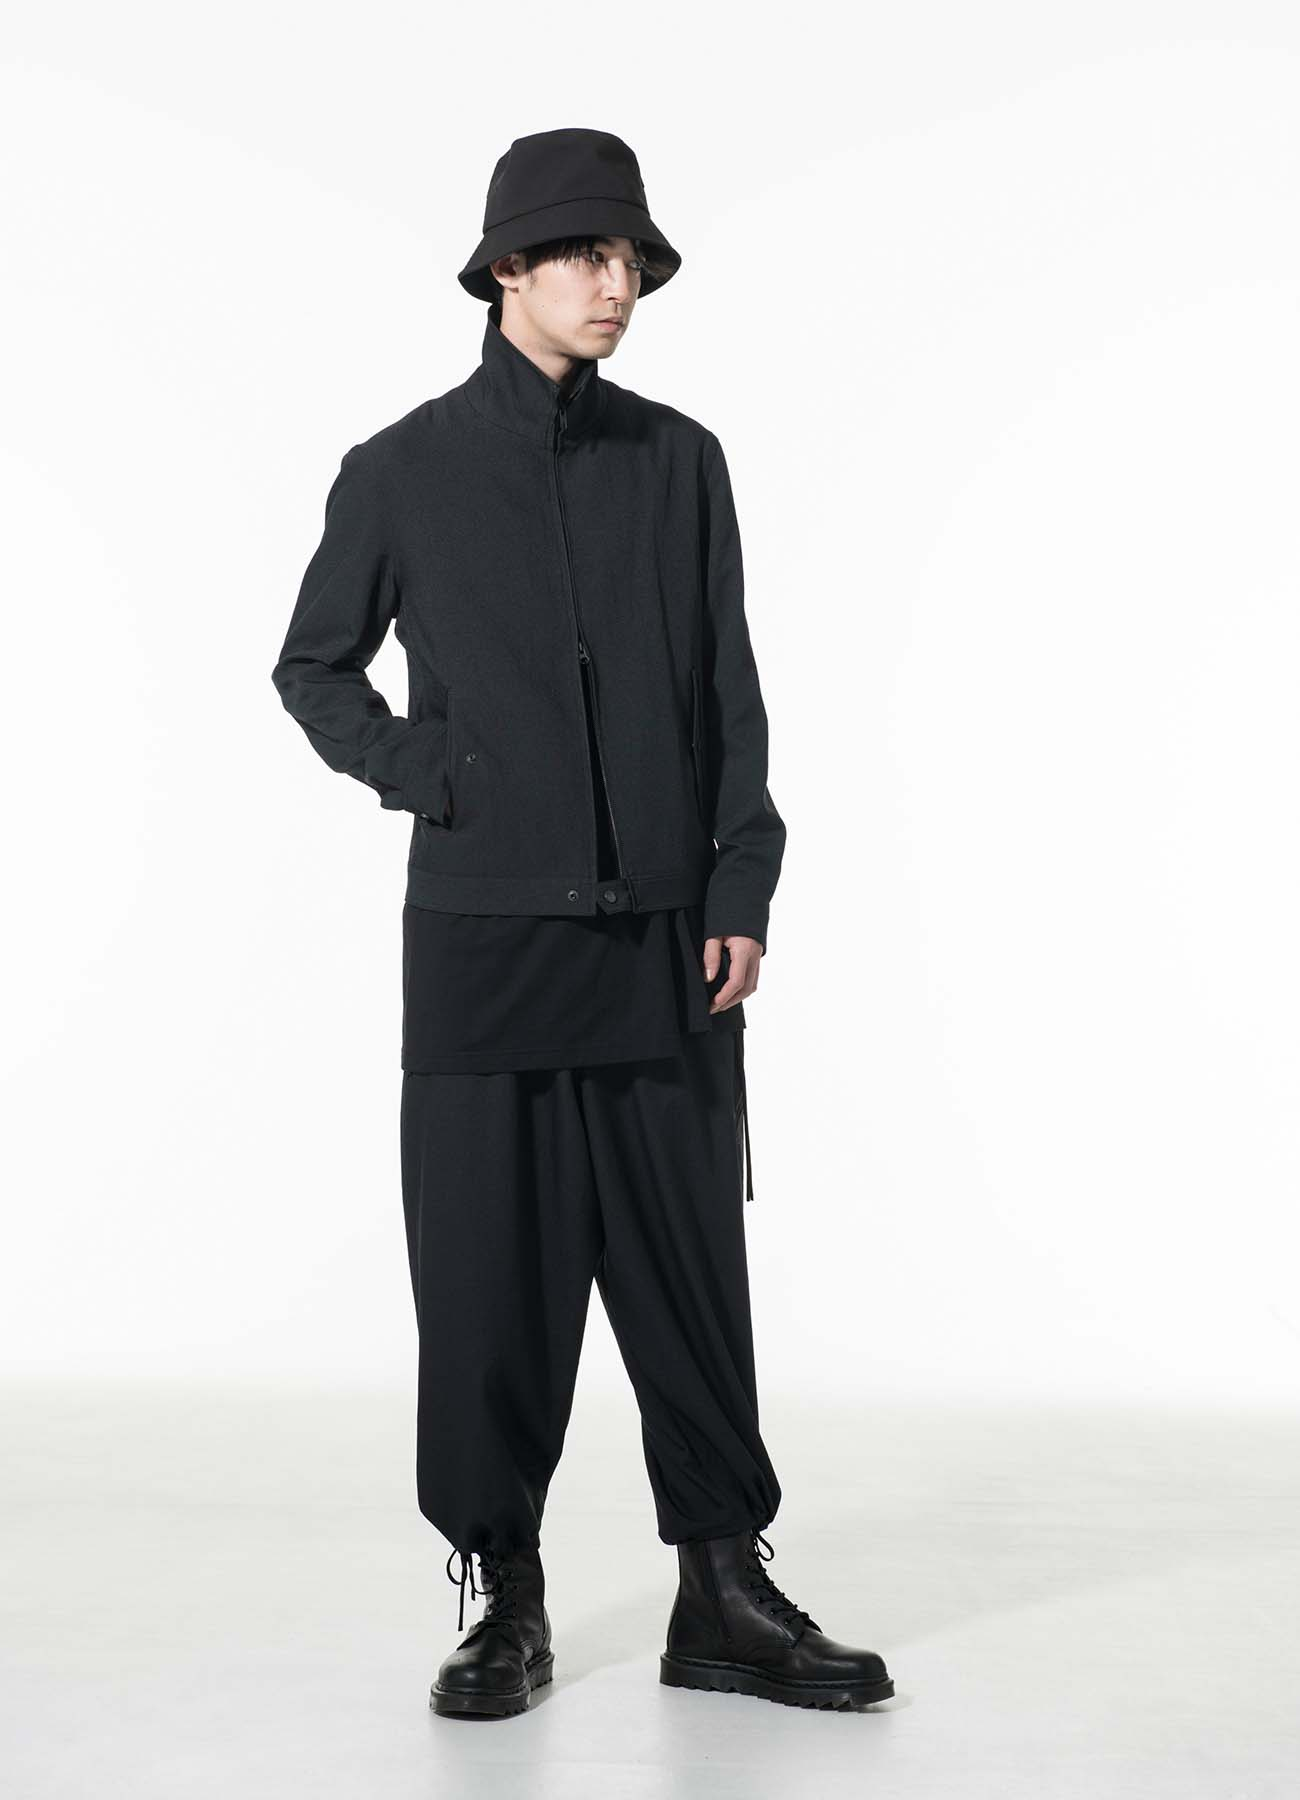 Shiwanoaru Polyester Stretch Twill Swing Top Jacket